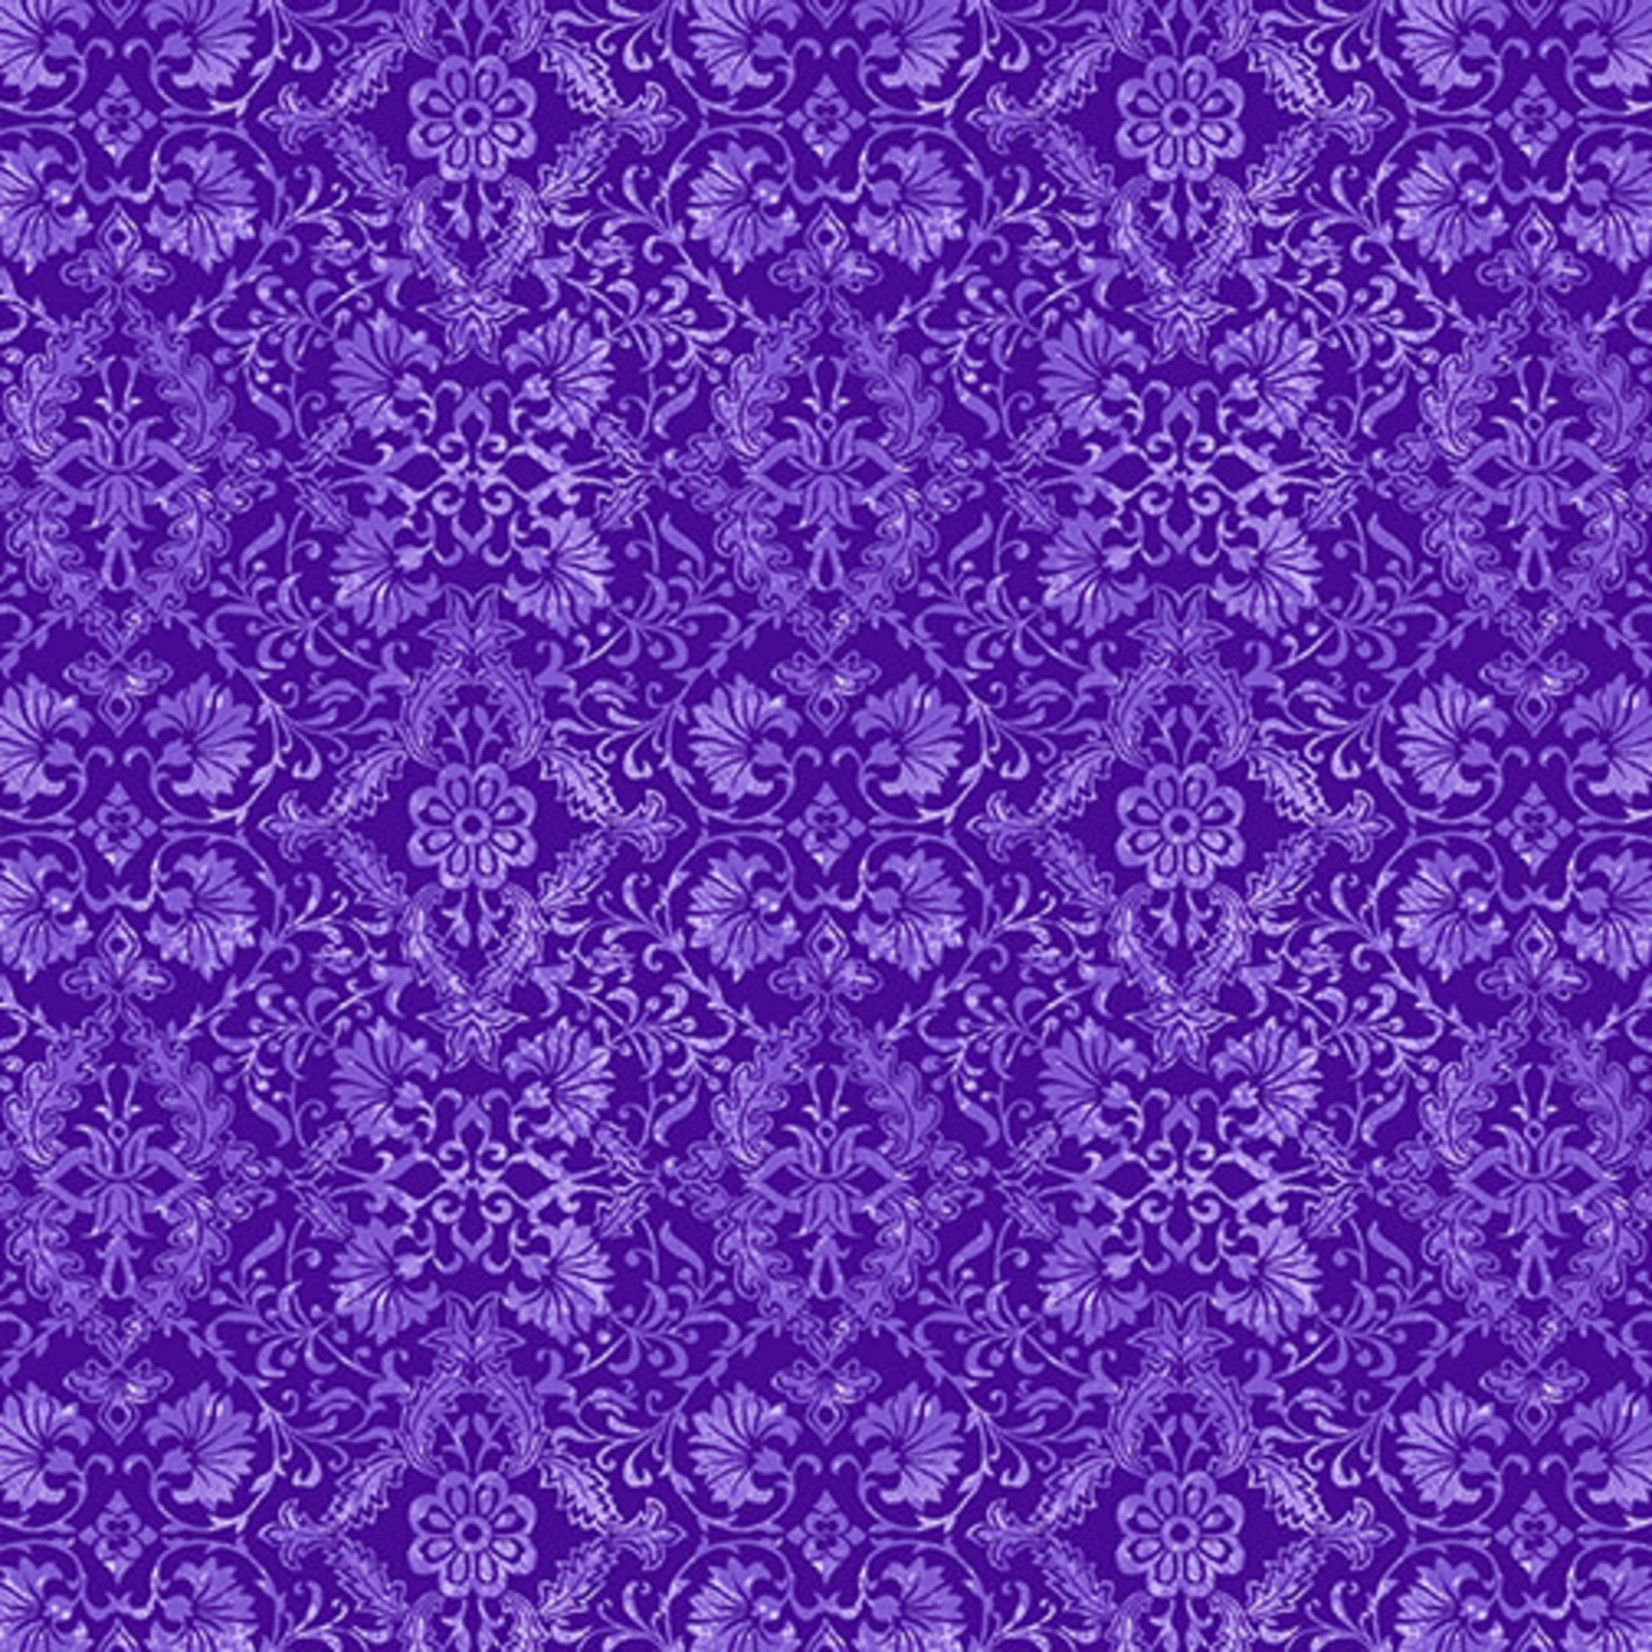 Benartex Studio Lavender Fields - Veronica Damask - Dark Purple